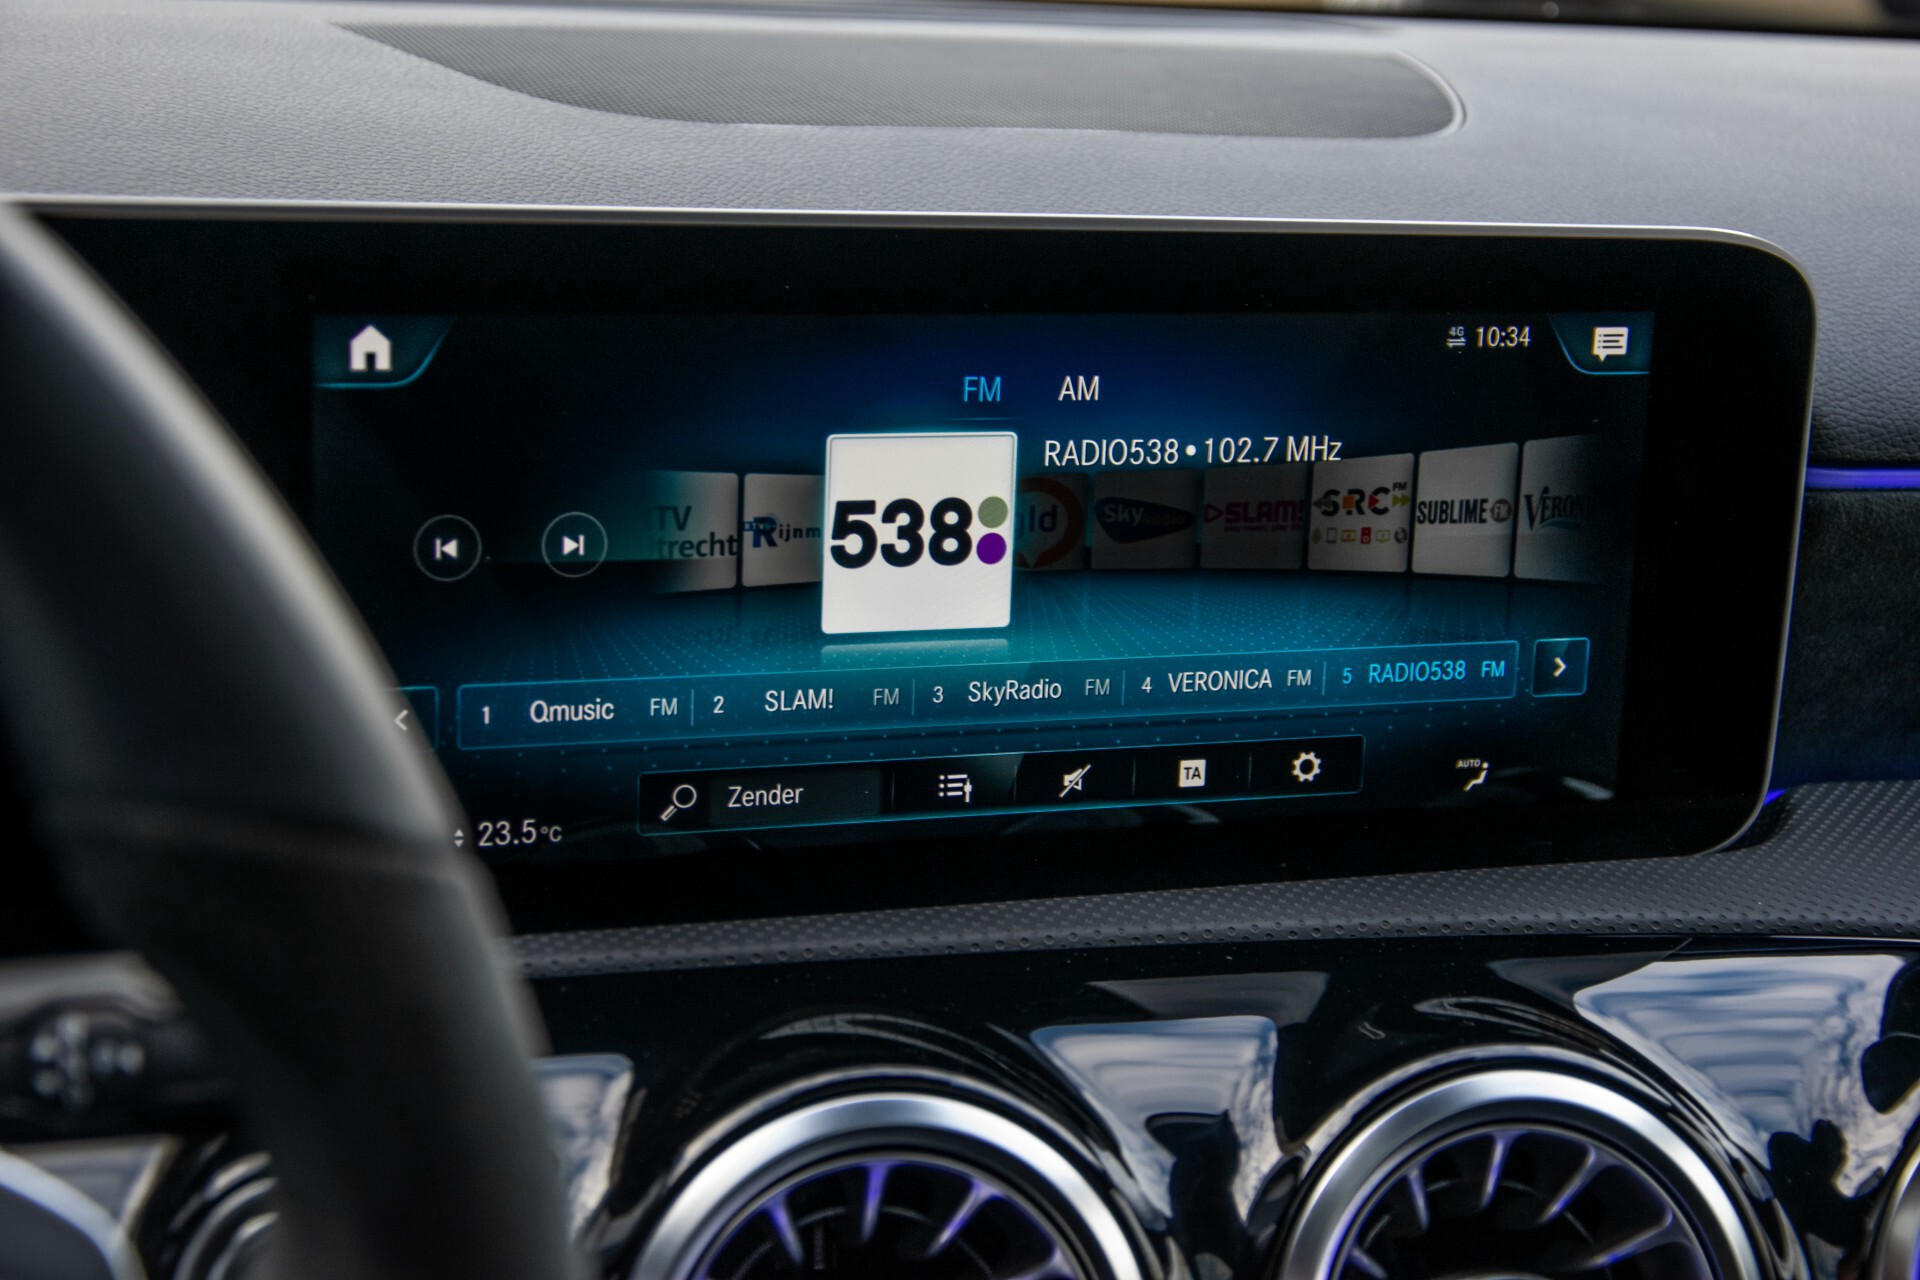 Mercedes-Benz A-Klasse 250 4-M AMG Panorama/Keyless-Entry/MBUX/HUD/Burmester/360/Multibeam LED Aut7 Foto 19